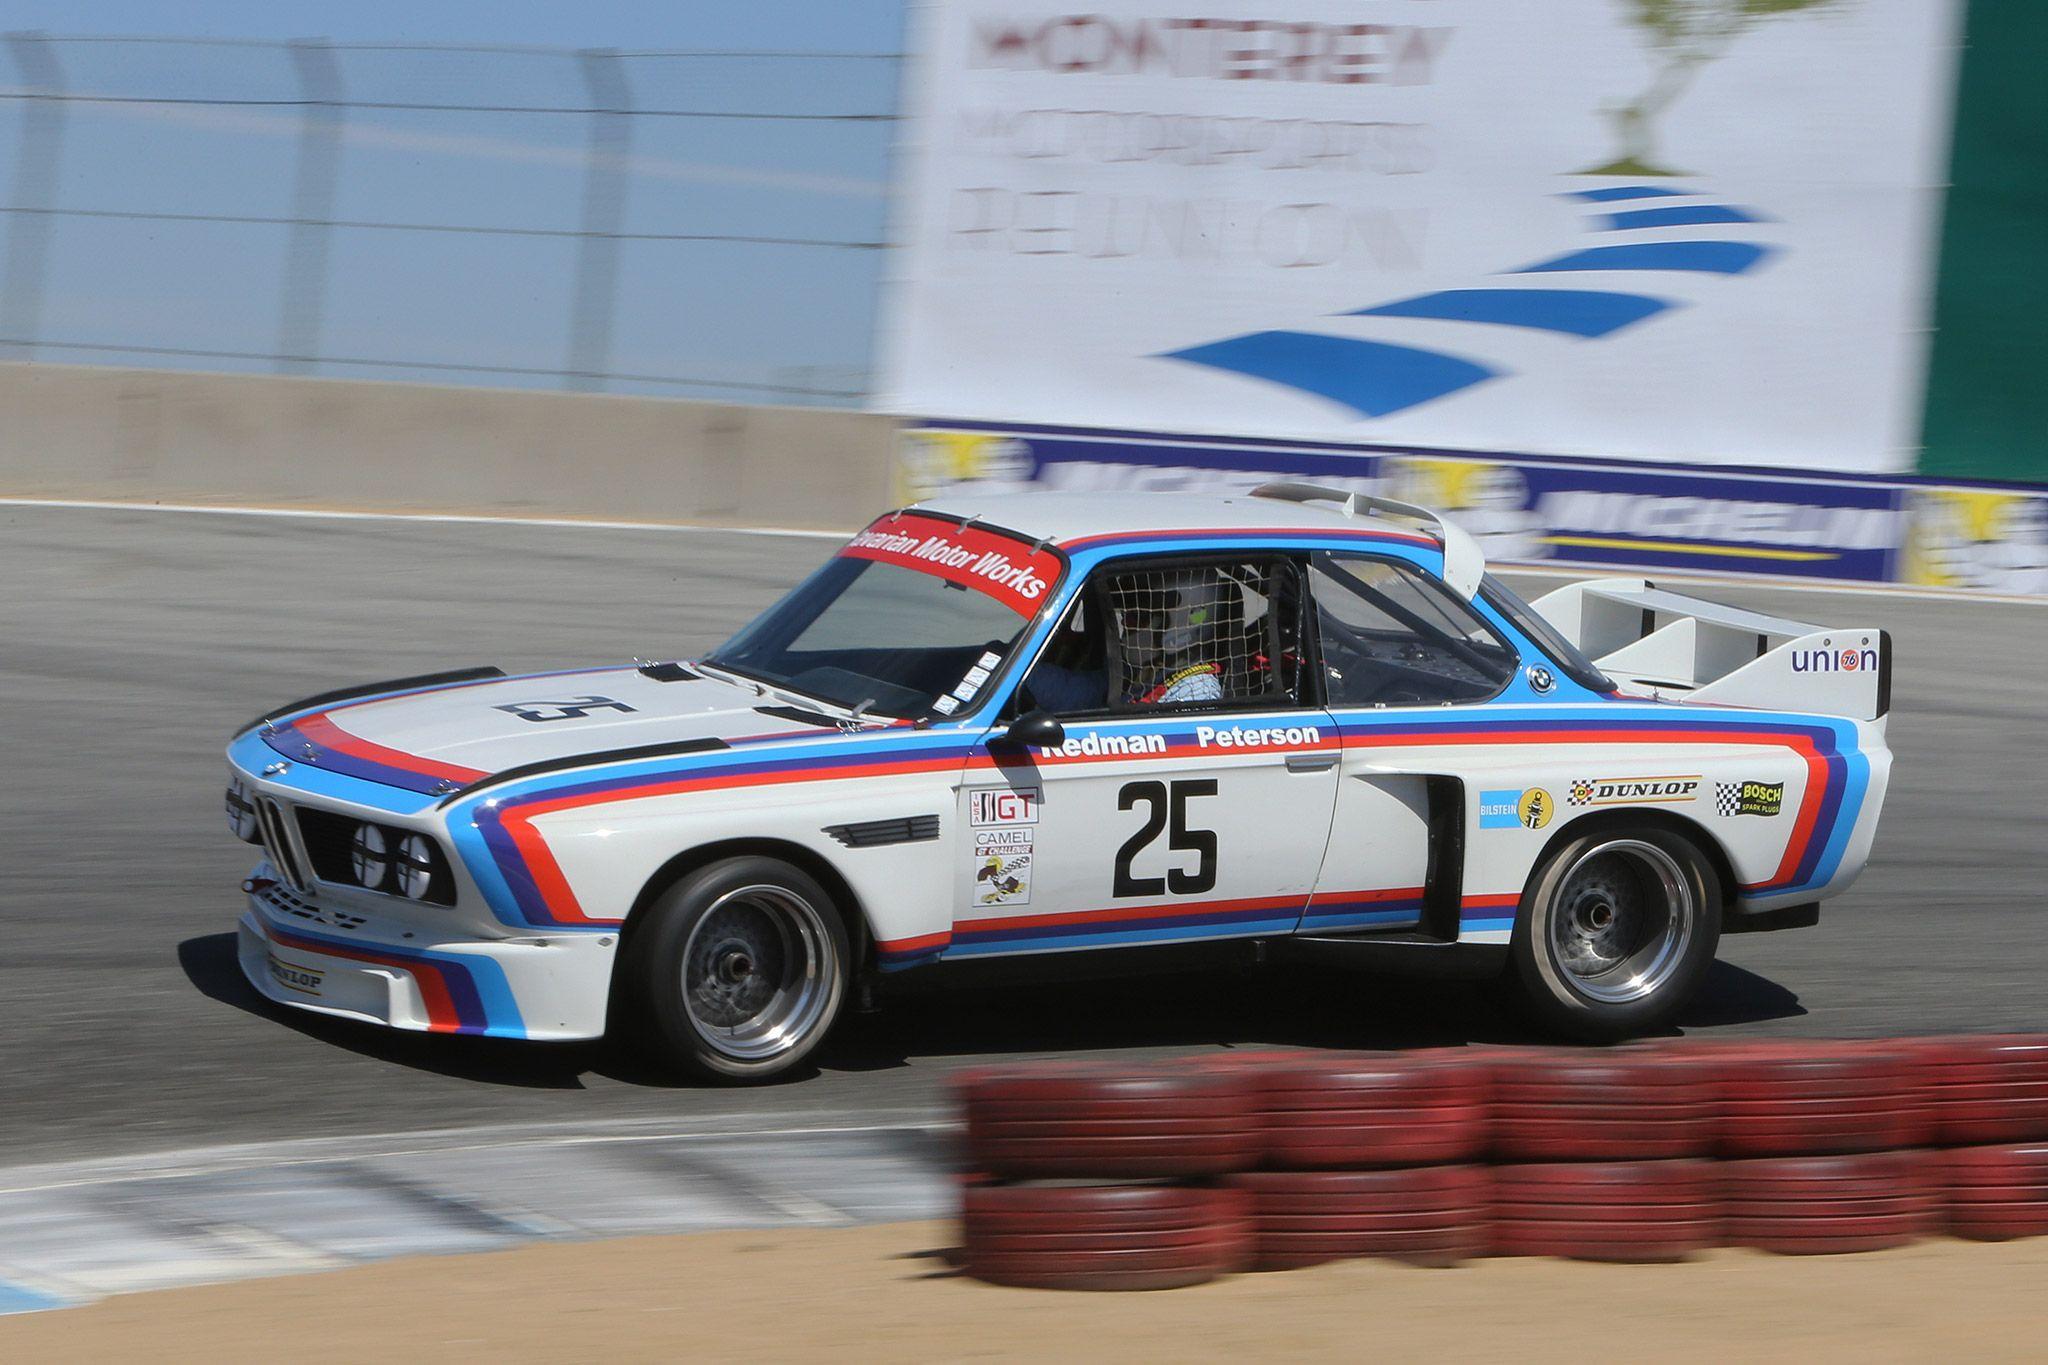 bmw-30csl-race-car-monterey-motorsports-reunion   PROTOTYPES ET ...